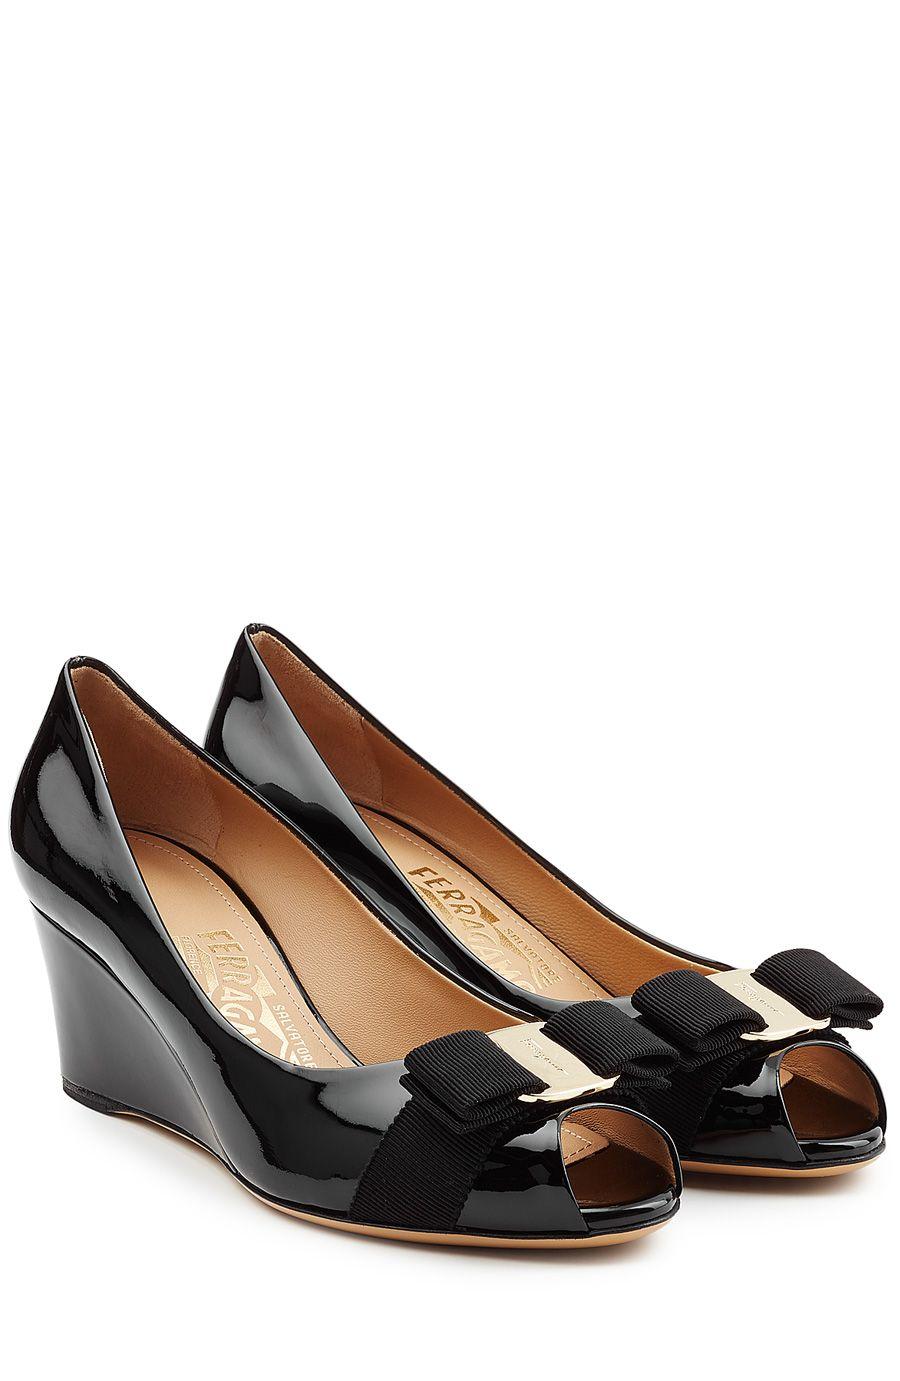 Salvatore Ferragamo Square-Toe Leather Flats free shipping sneakernews tumblr cheap online clearance shopping online free shipping perfect pSw9A0UE